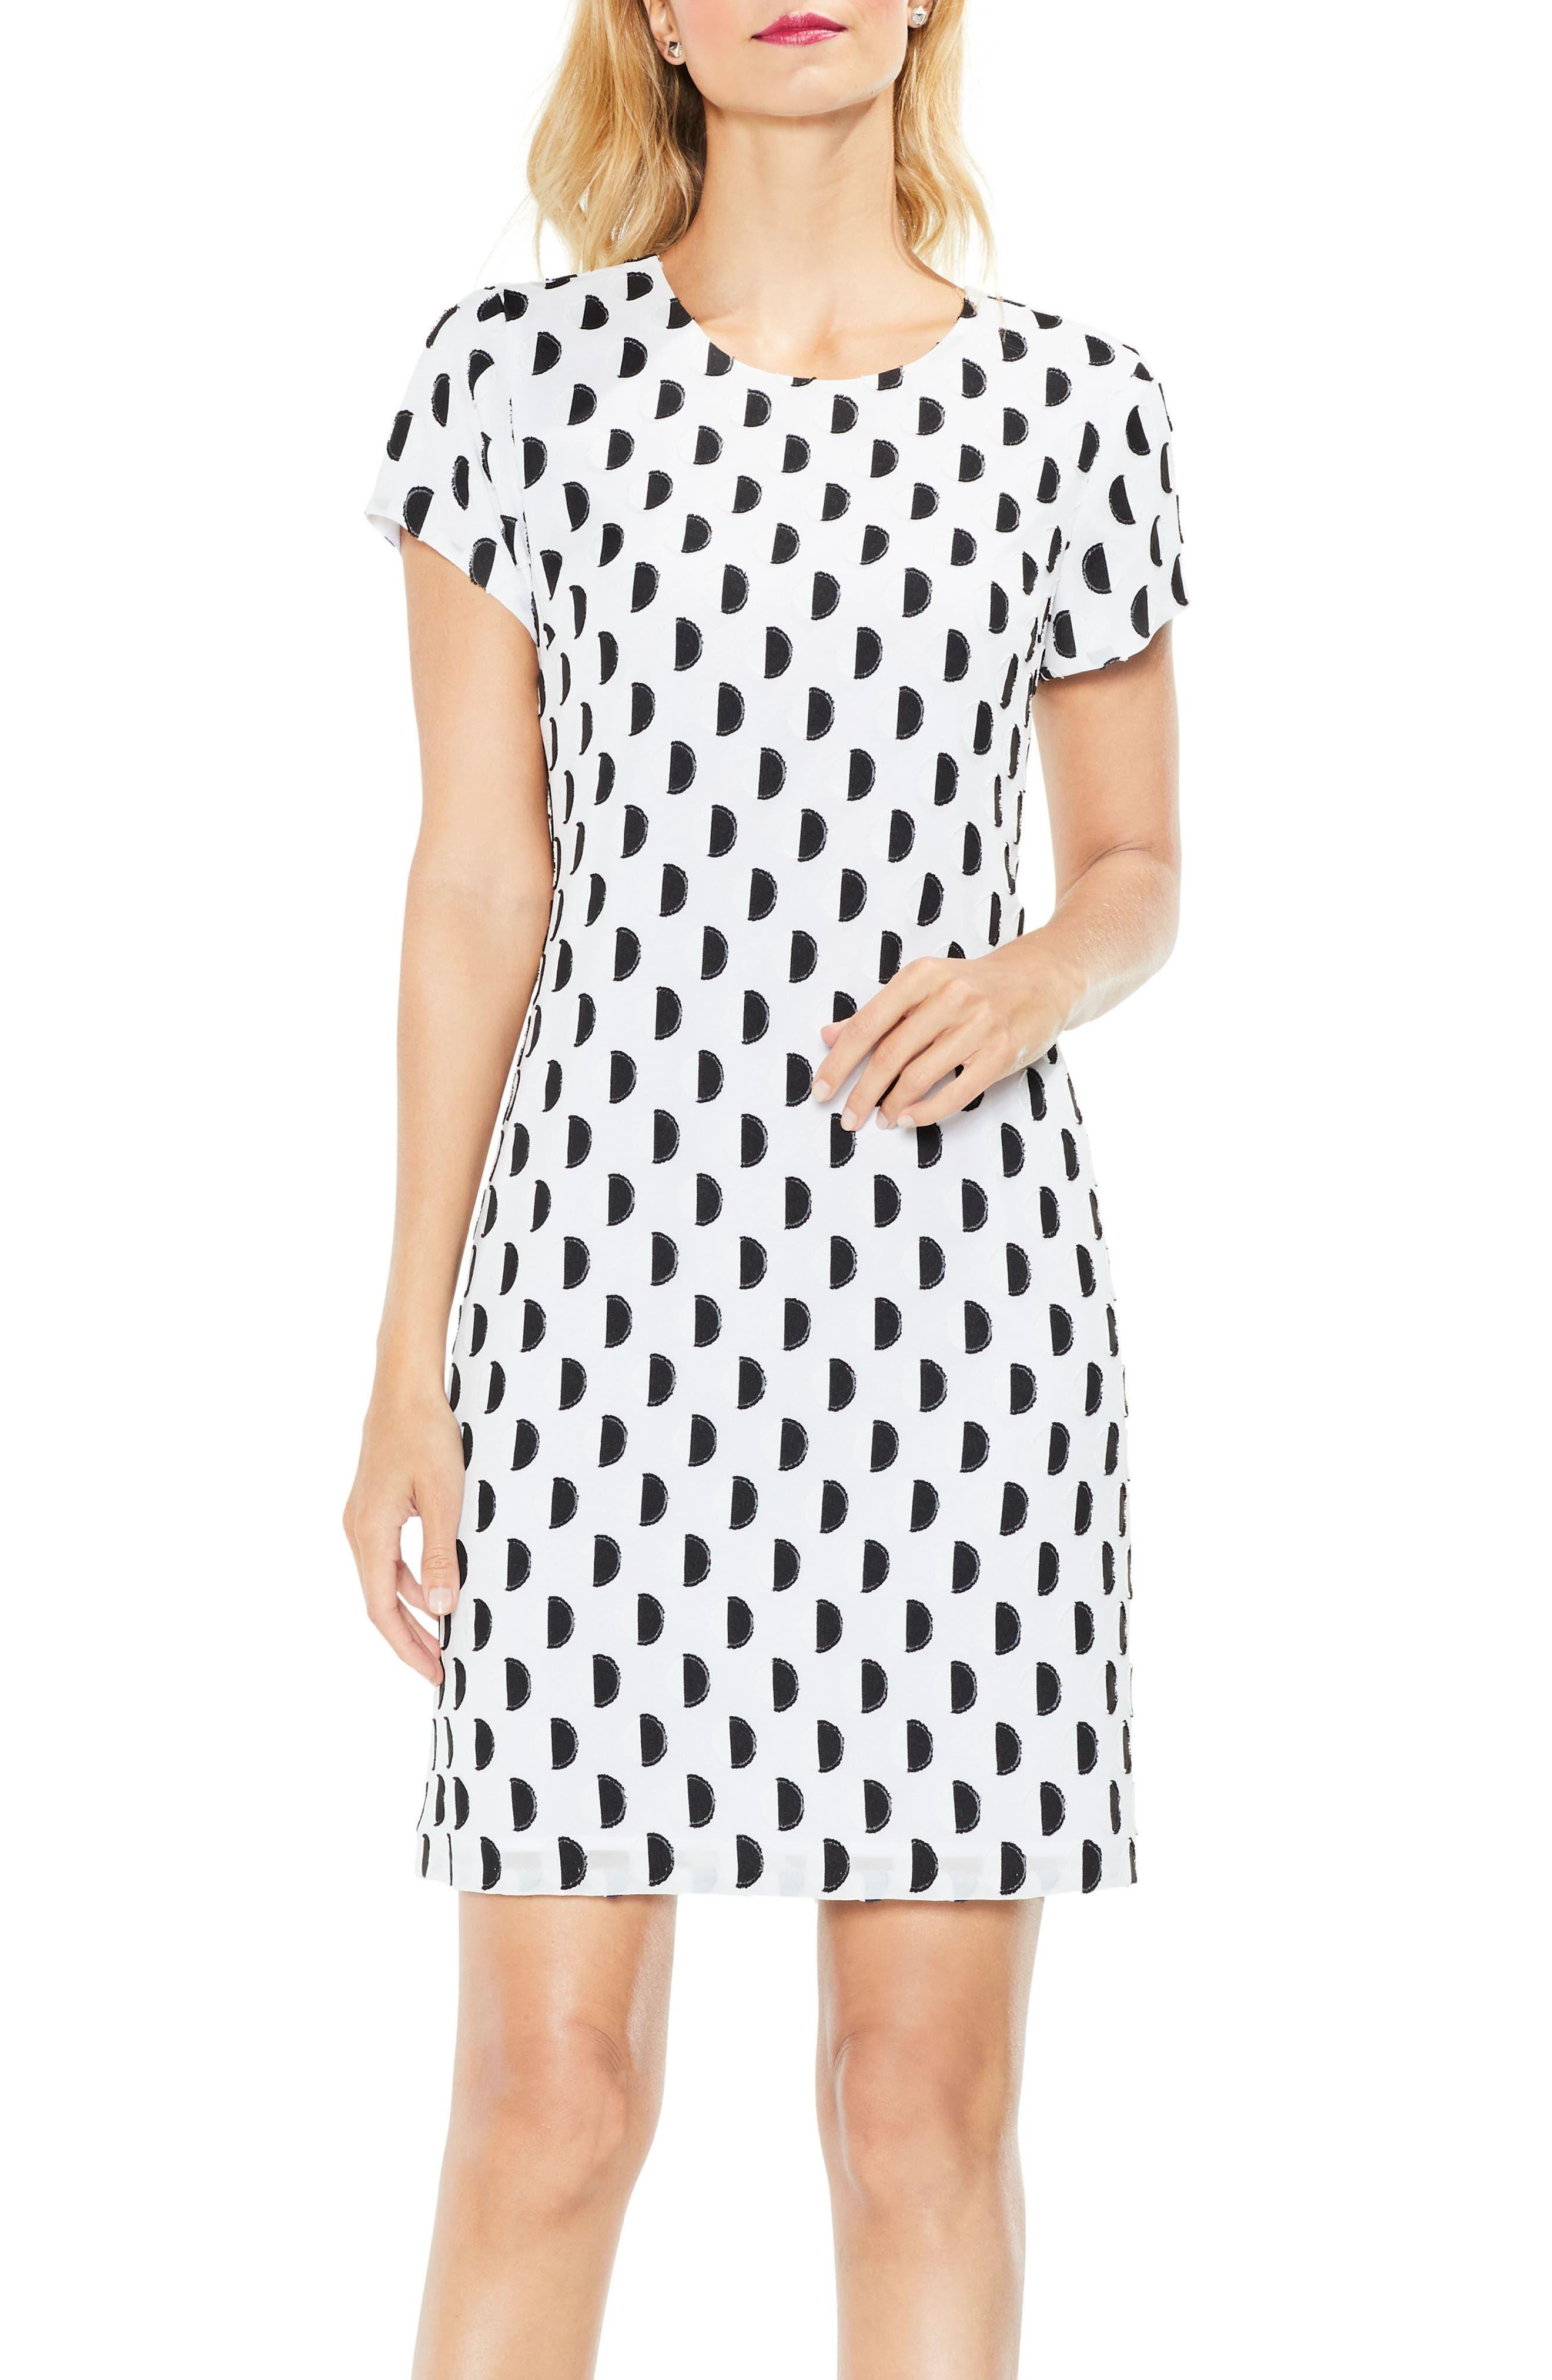 Vince Camuto Graphic Clip Dot Shift Dress